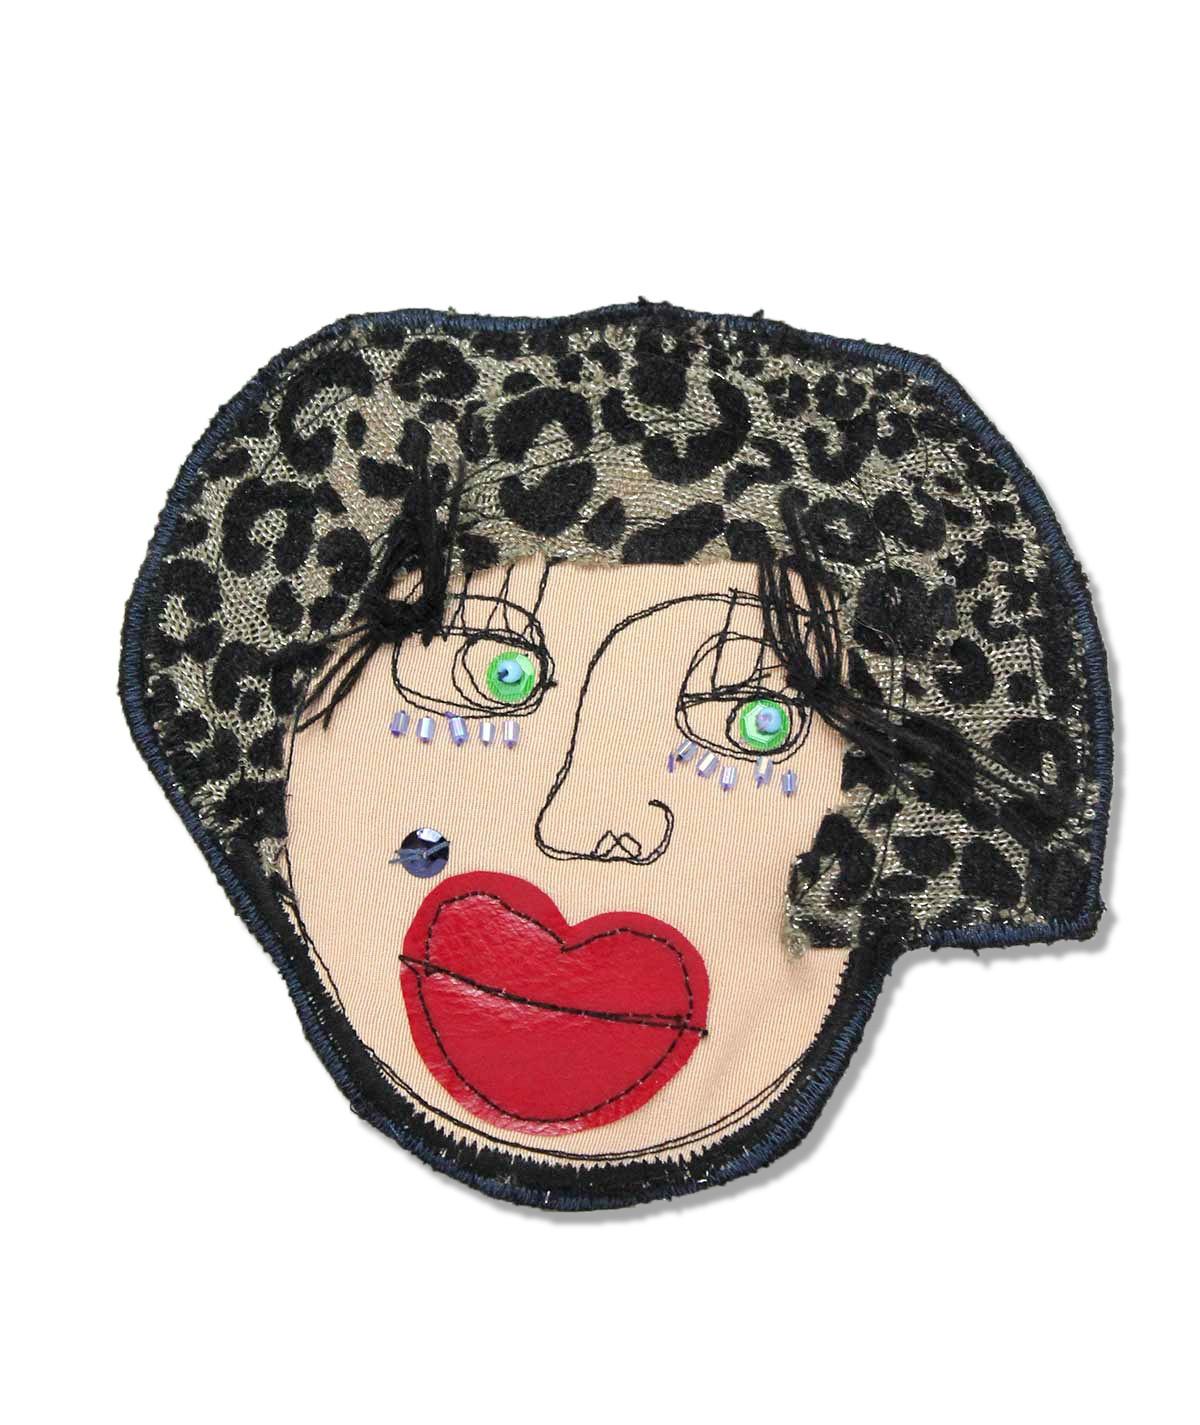 Mary - fabric brooch